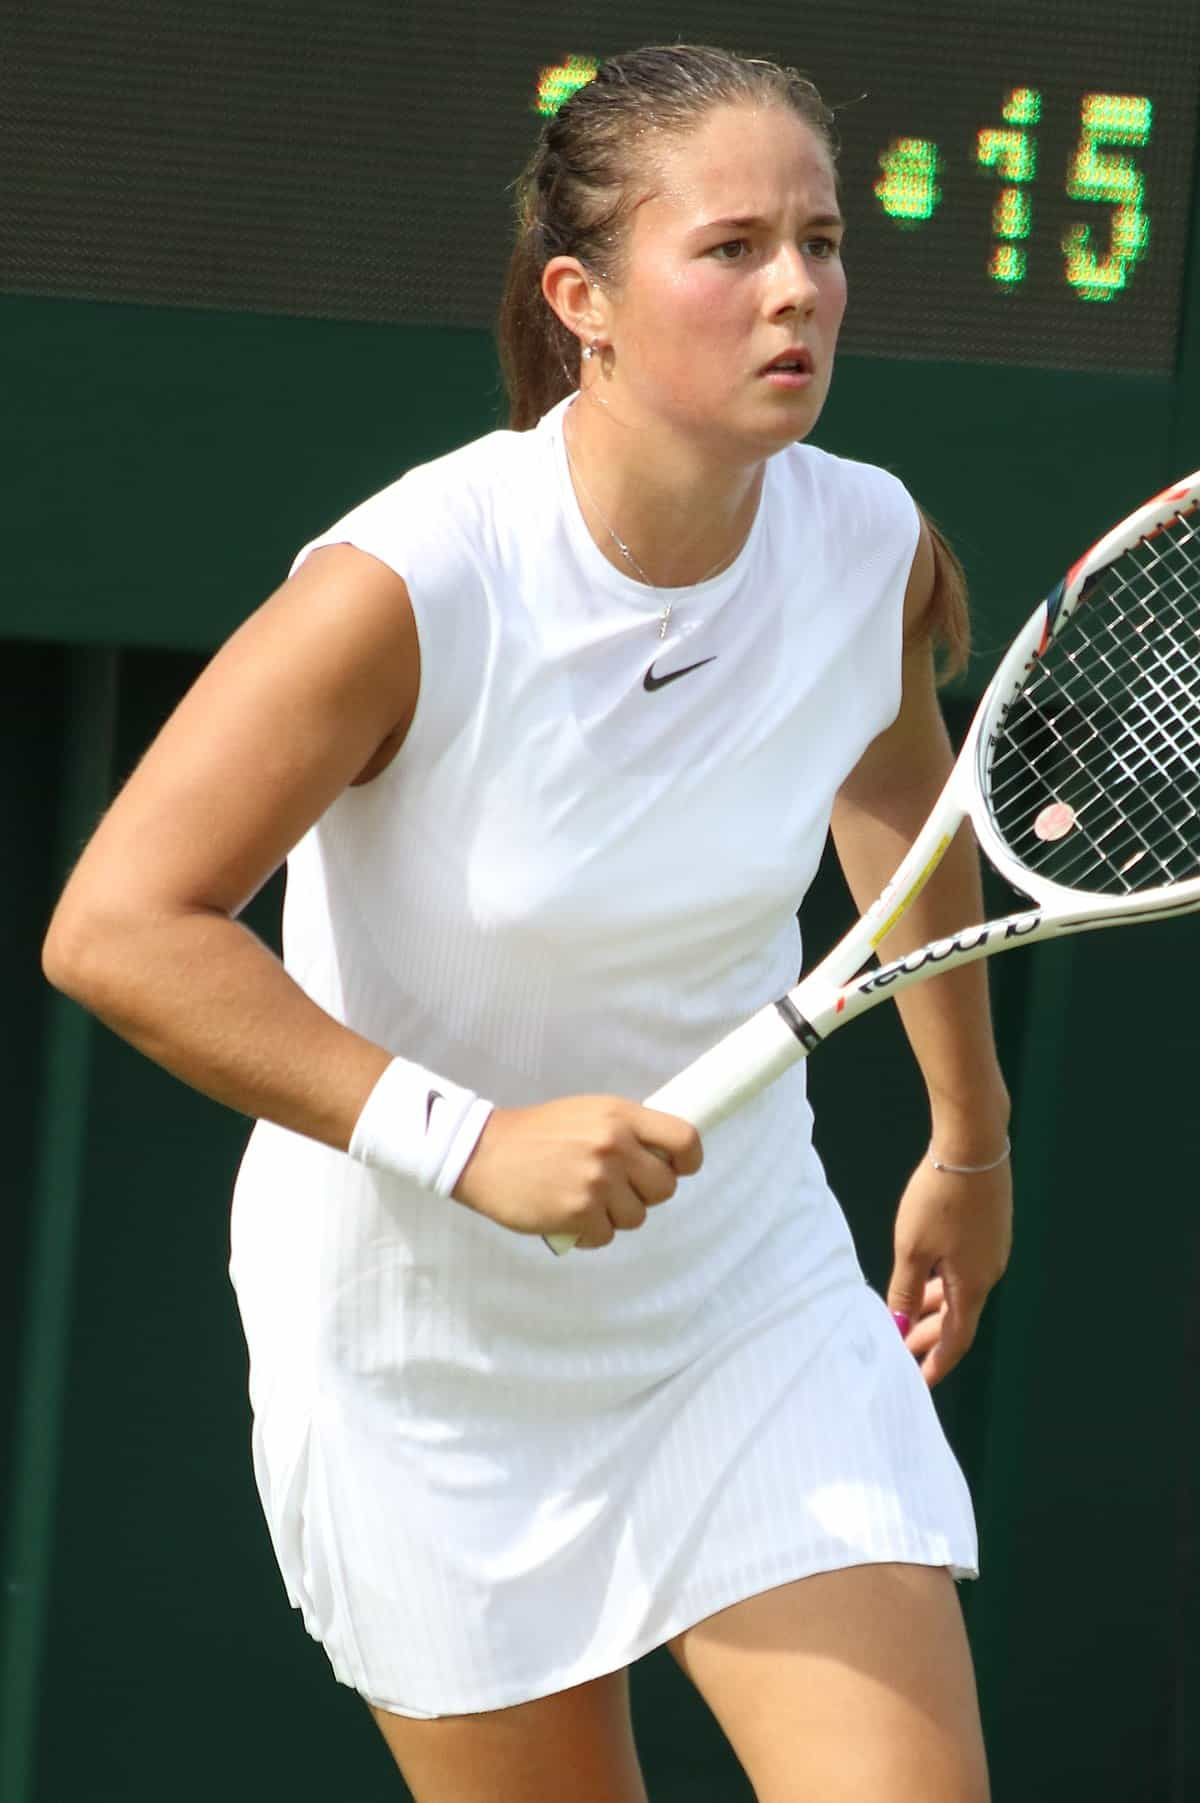 Women's Tennis Champion Daria Kasatkina.